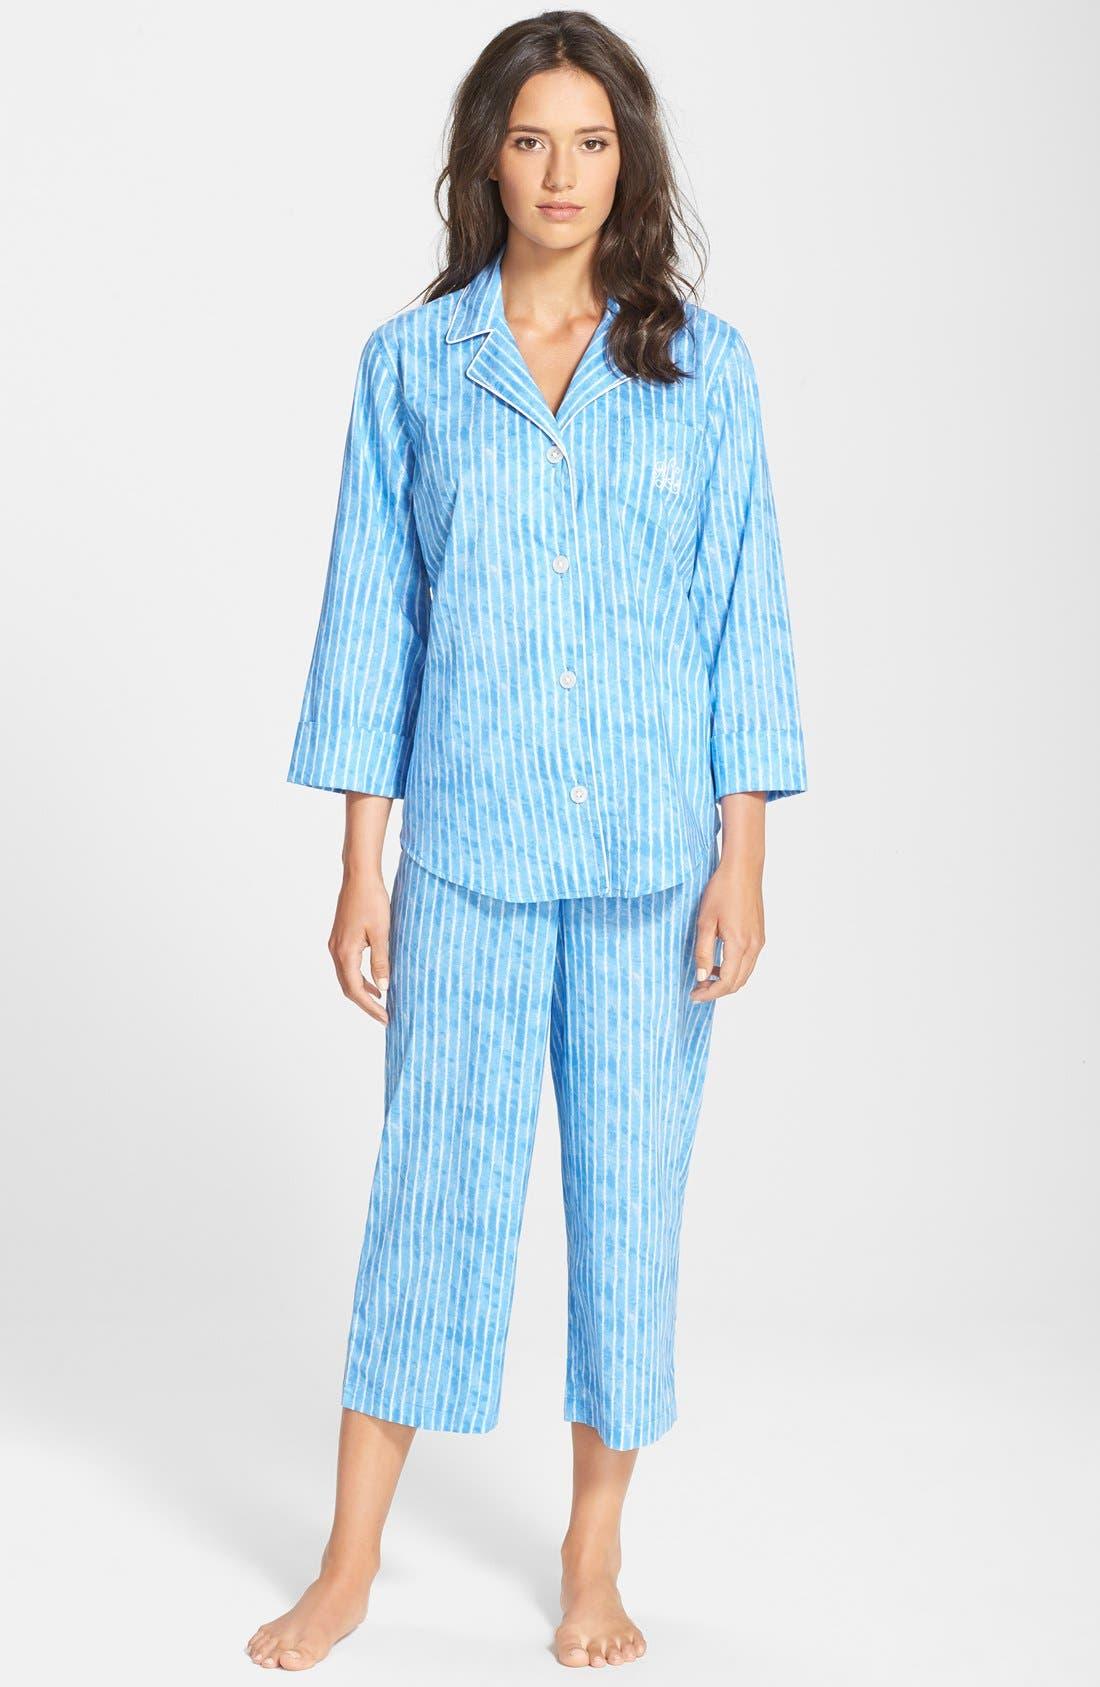 Alternate Image 1 Selected - Lauren Ralph Lauren Notch Collar Capri Pajamas